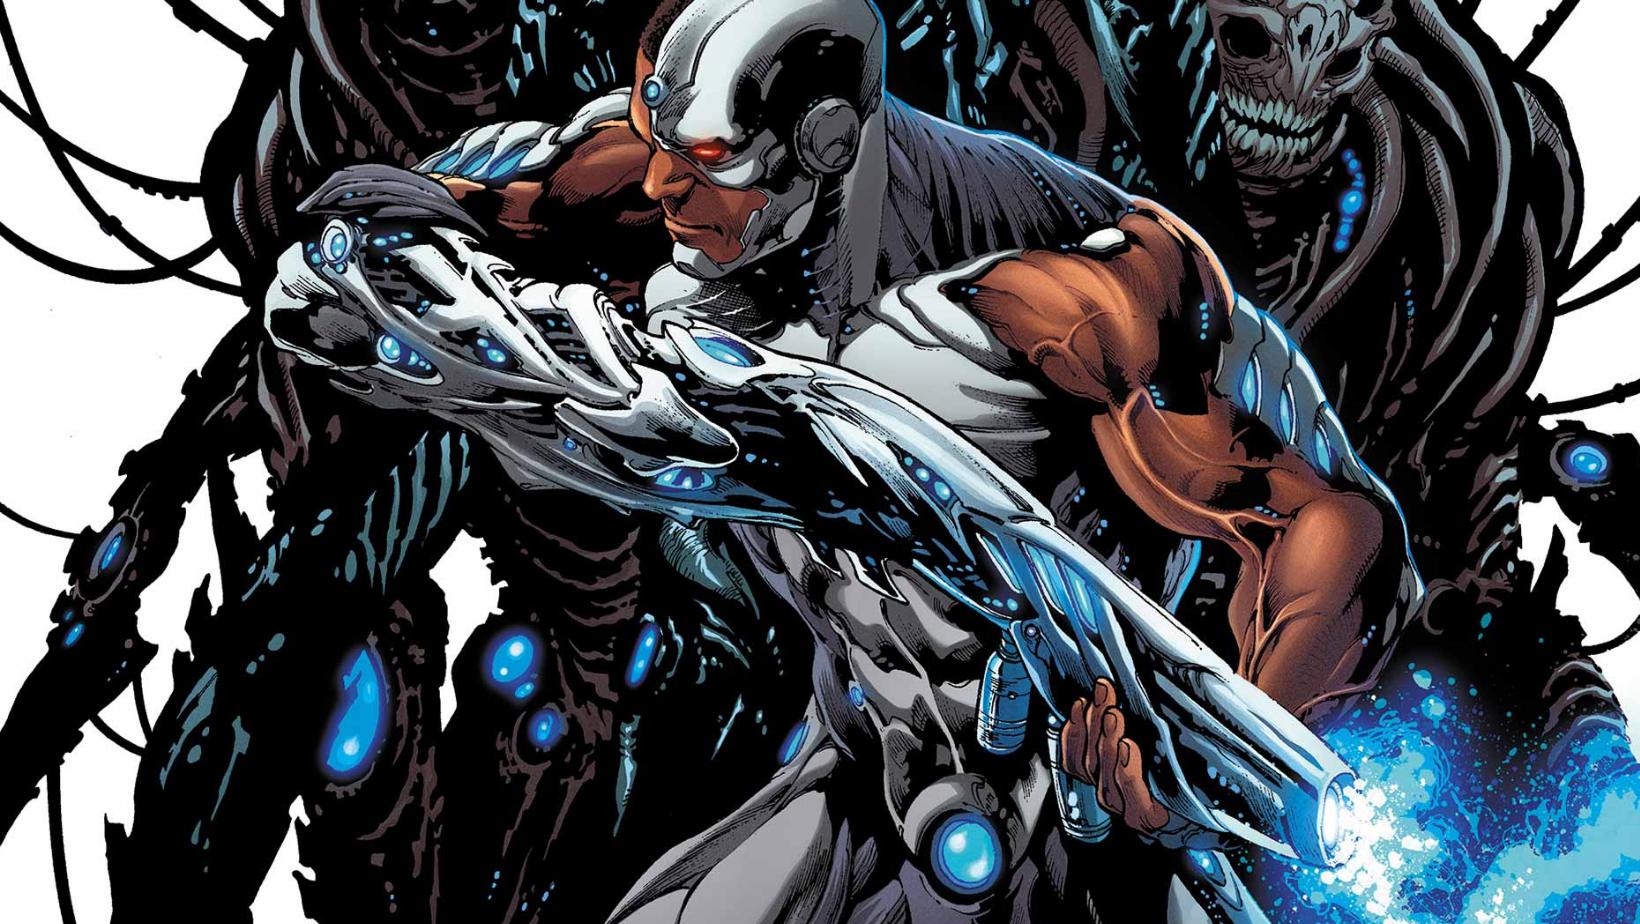 Cyborg Underrated Powers